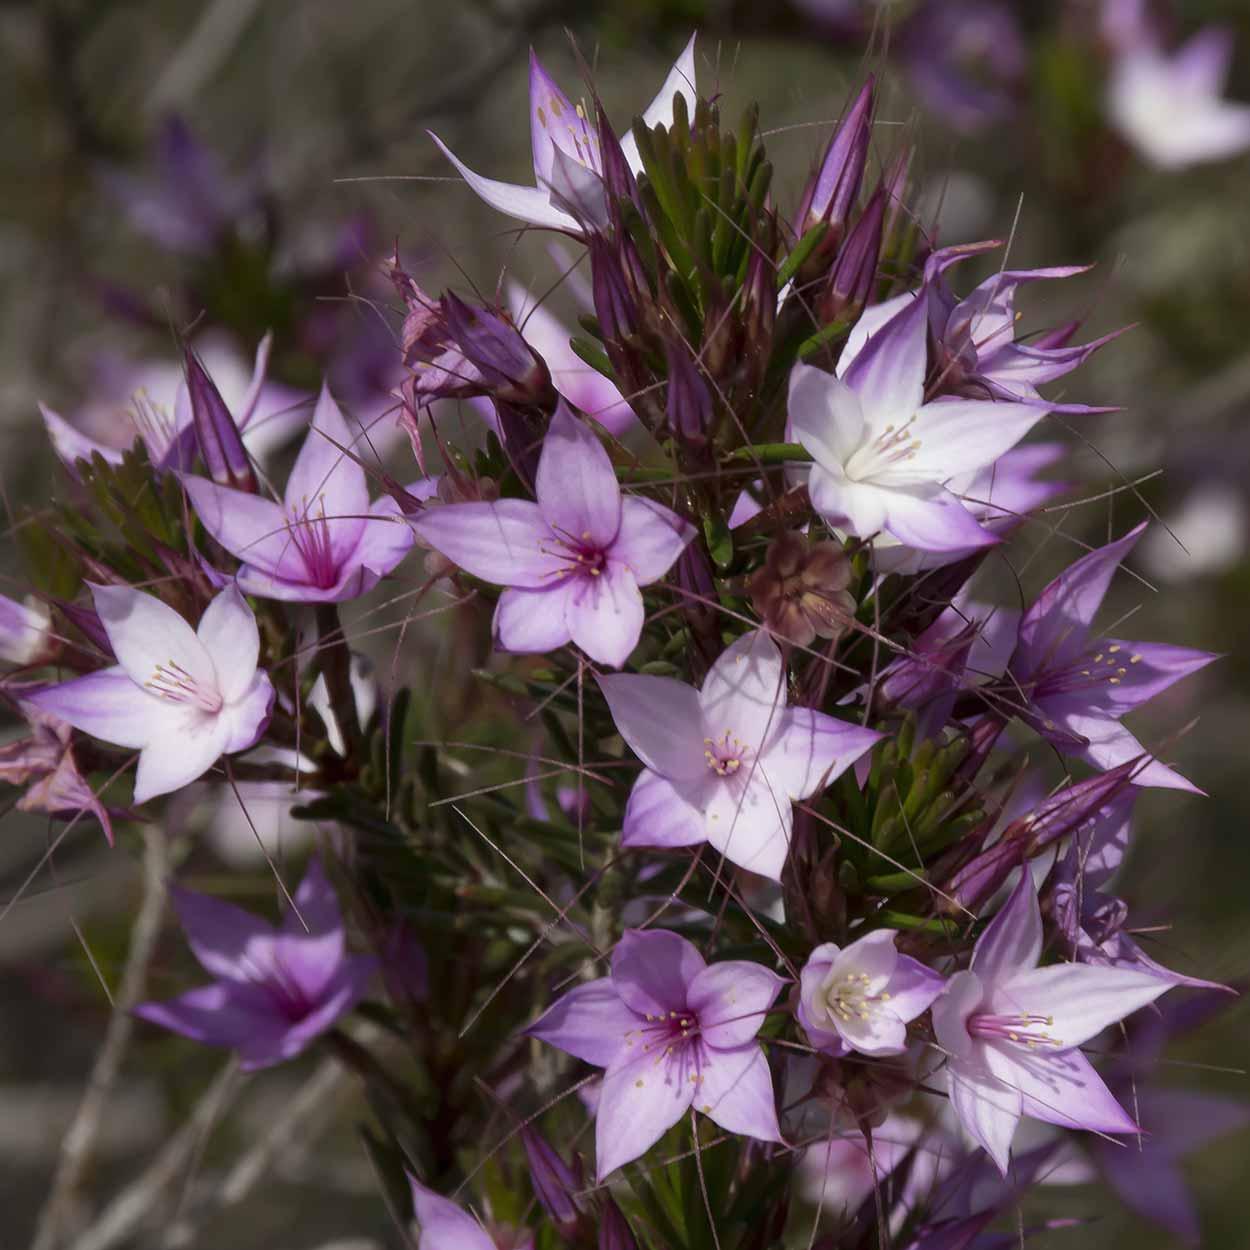 Starflowers on the Palm Terrace Walk, Mundy Regional Park, Perth, Western Australia